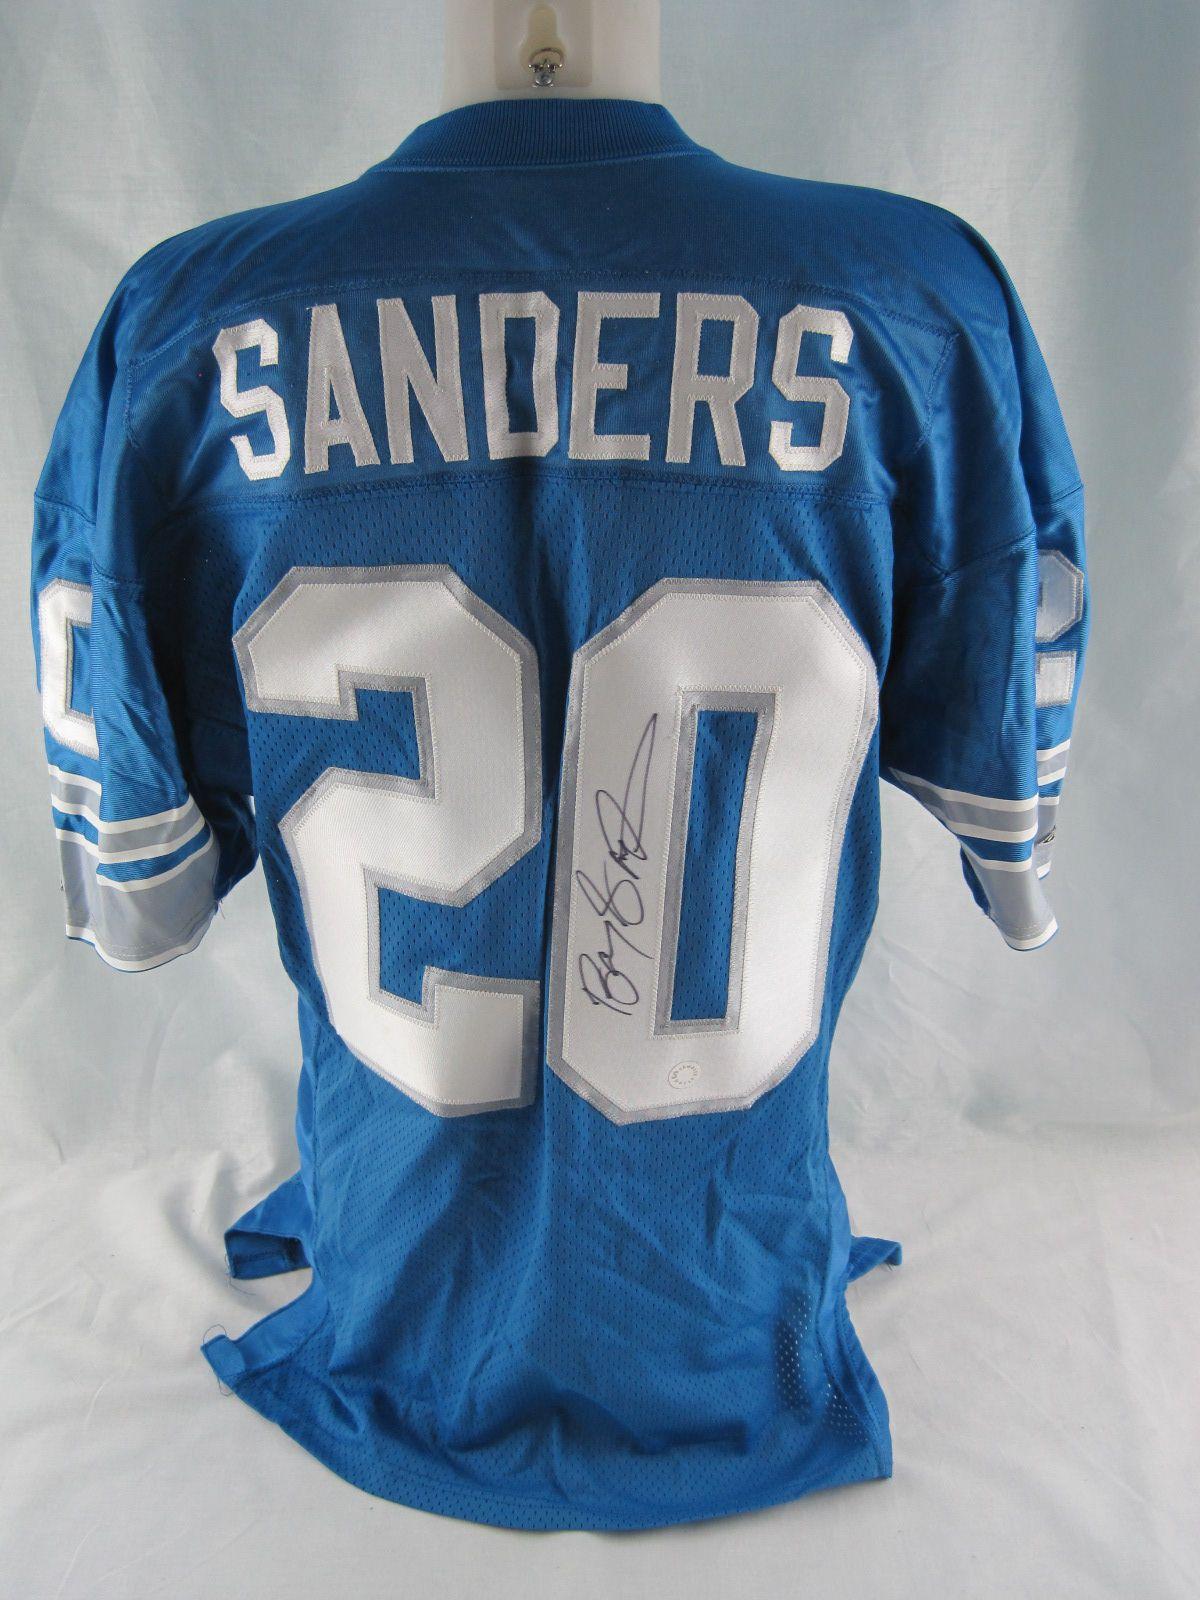 191e5b1b7 ... Barry Sanders 1994 Detroit Lions 75th Anniversary Autographed Jersey .